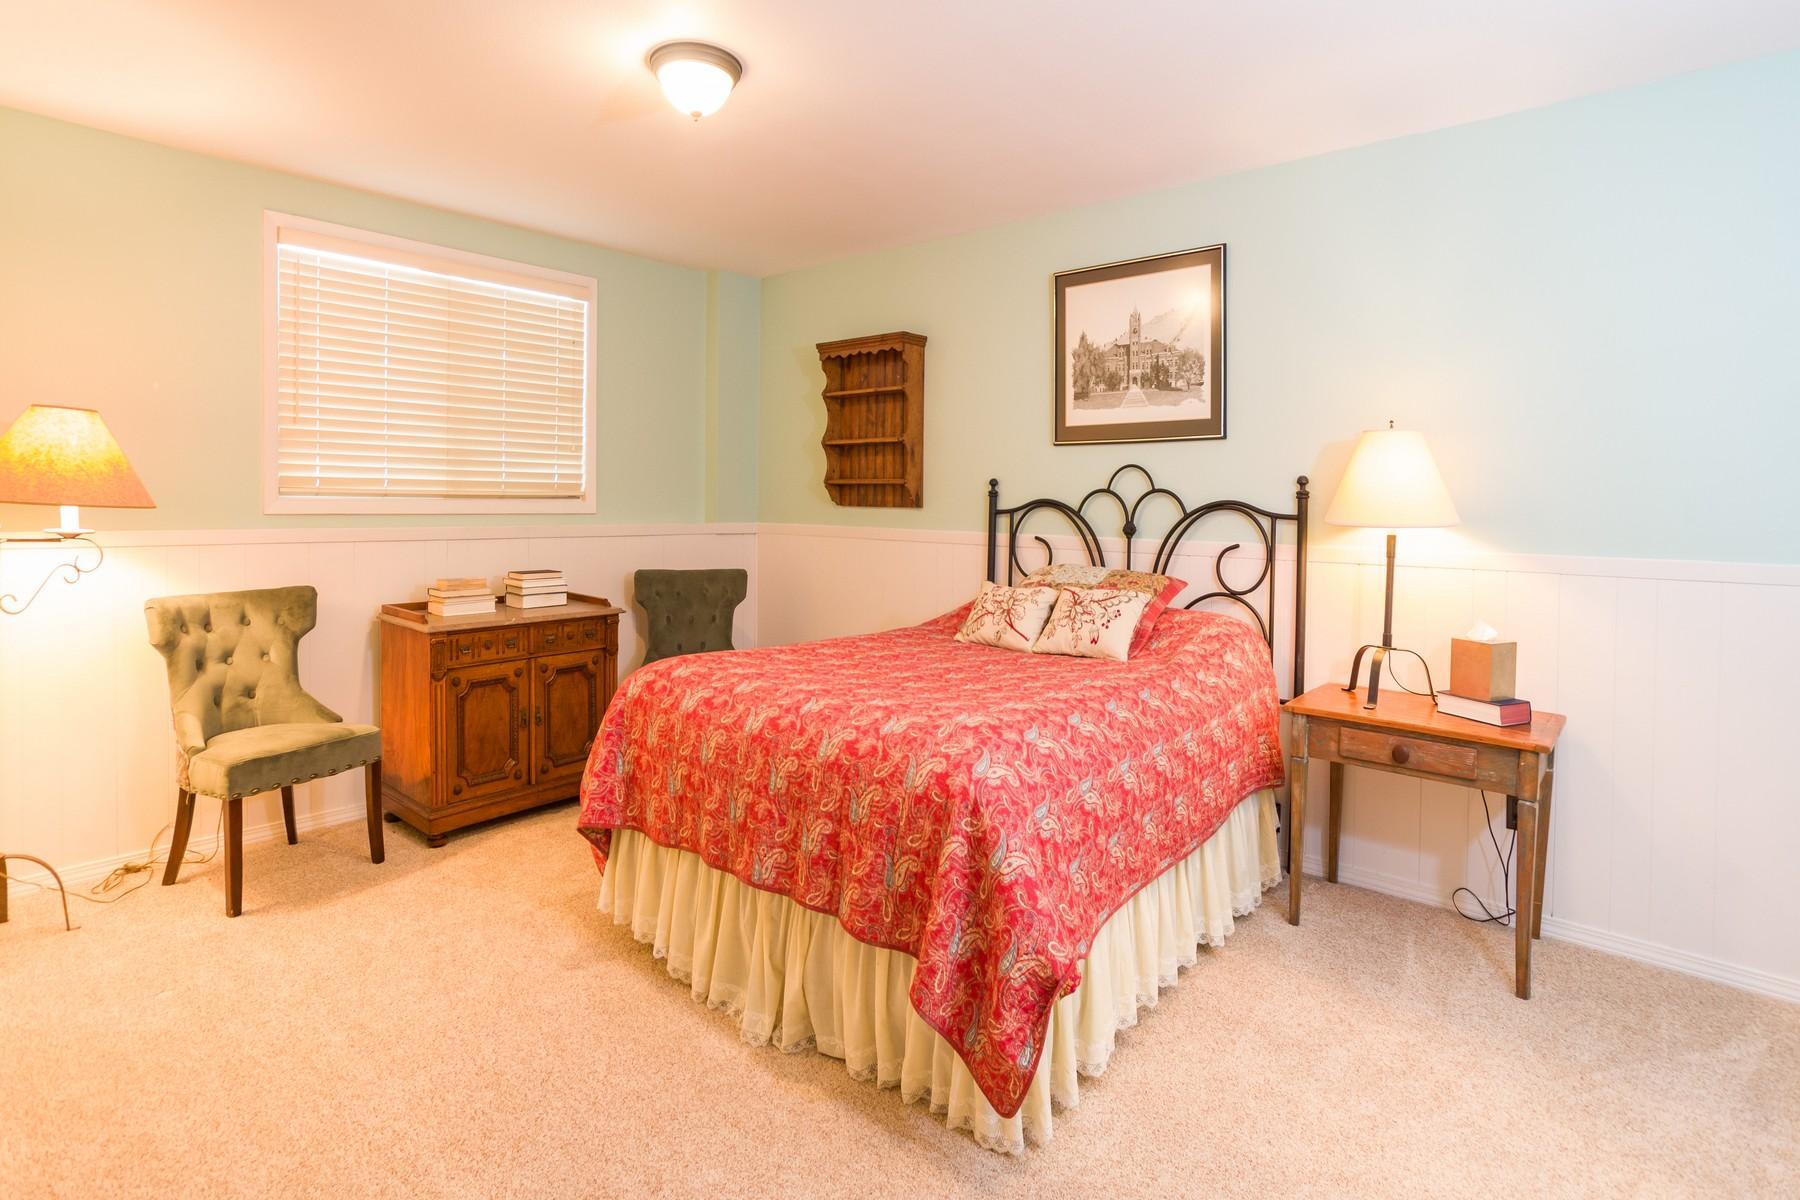 Additional photo for property listing at 163 Golf Terrace , Bigfork, MT 59911 163  Golf Terr Bigfork, Montana 59911 United States